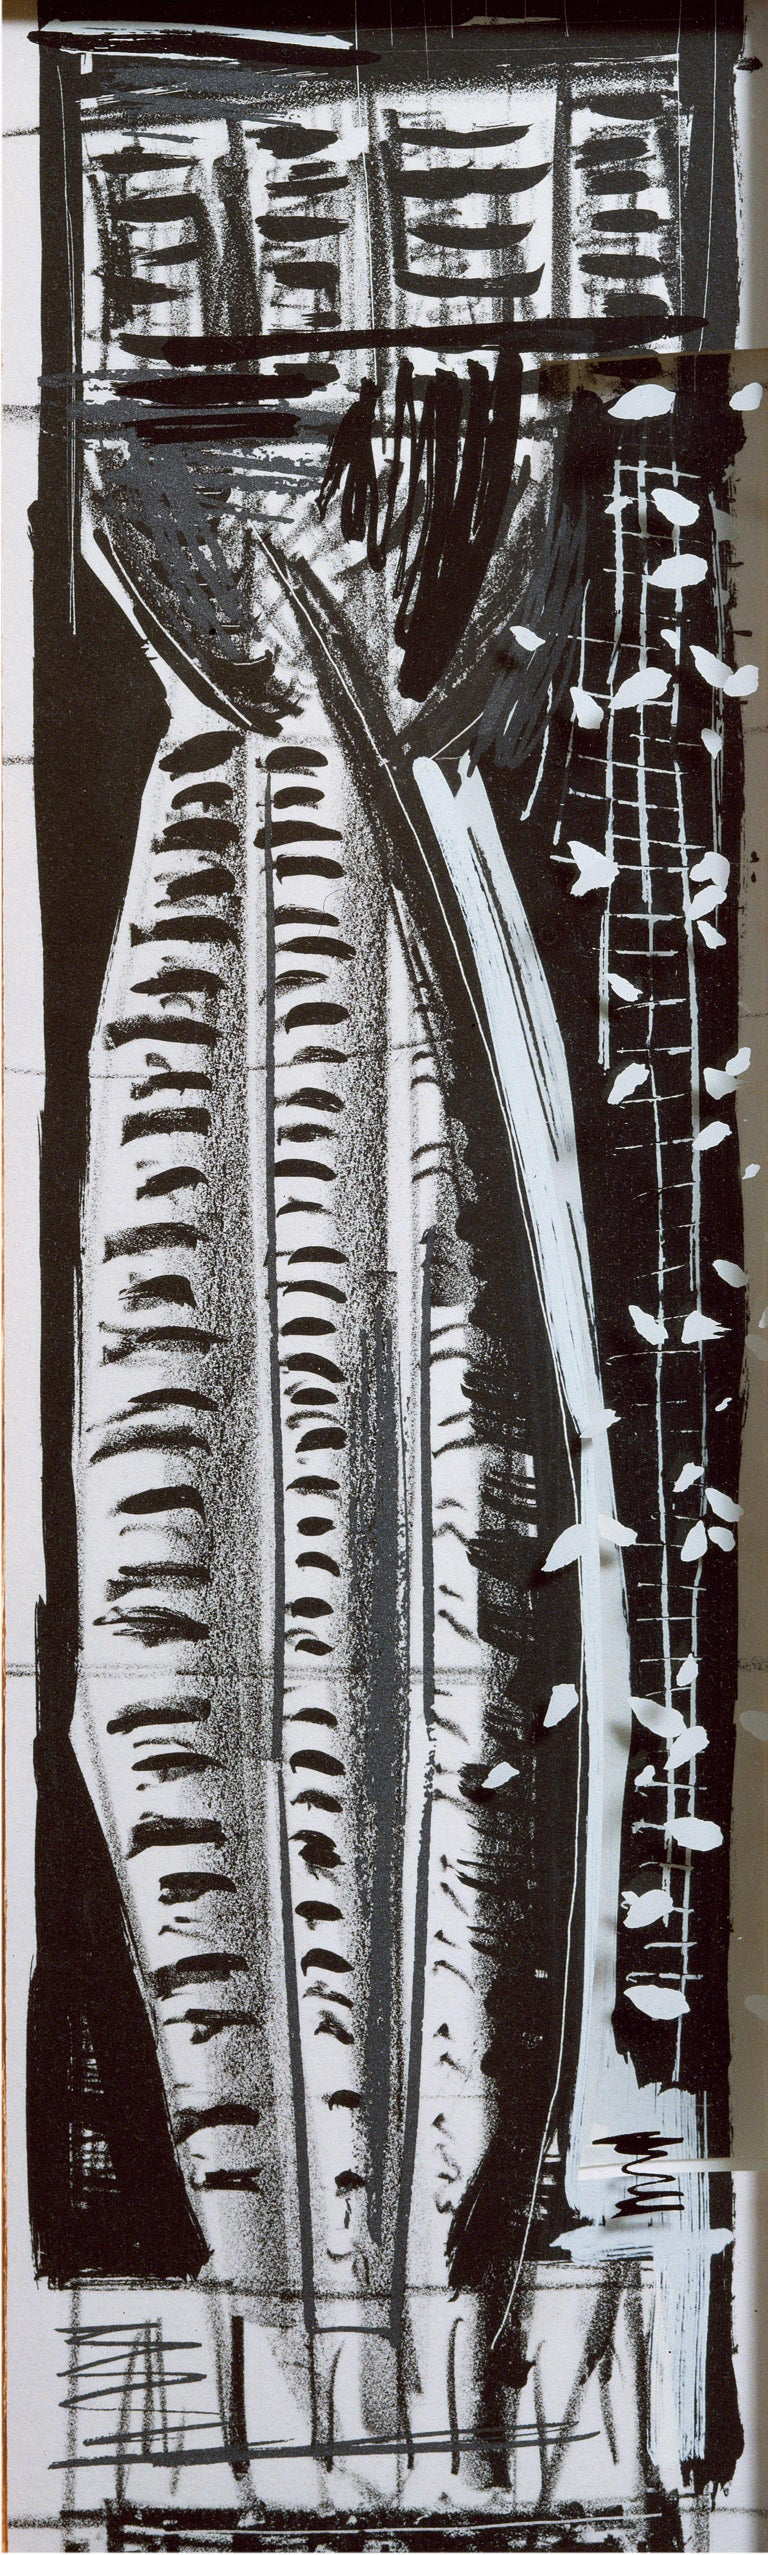 Vladimir: Greek column abstract etching and screenprint, handmade paper frame - Print by Michael Hurson